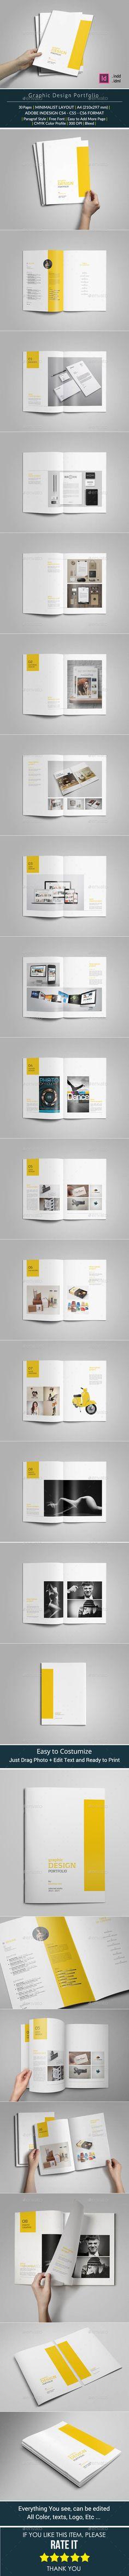 Portfolio Brochure Template #design Download: http://graphicriver.net/item/portfolio-brochure-template/10393655?ref=ksioks